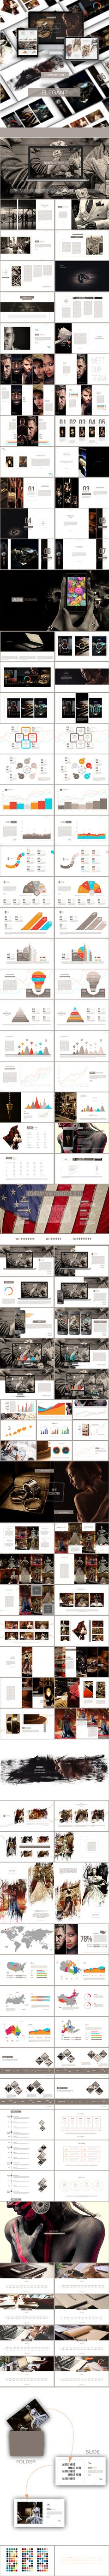 Elegant Powerpoint Template. Download here: http://graphicriver.net/item/elegant-powerpoint-template/15609643?ref=ksioks